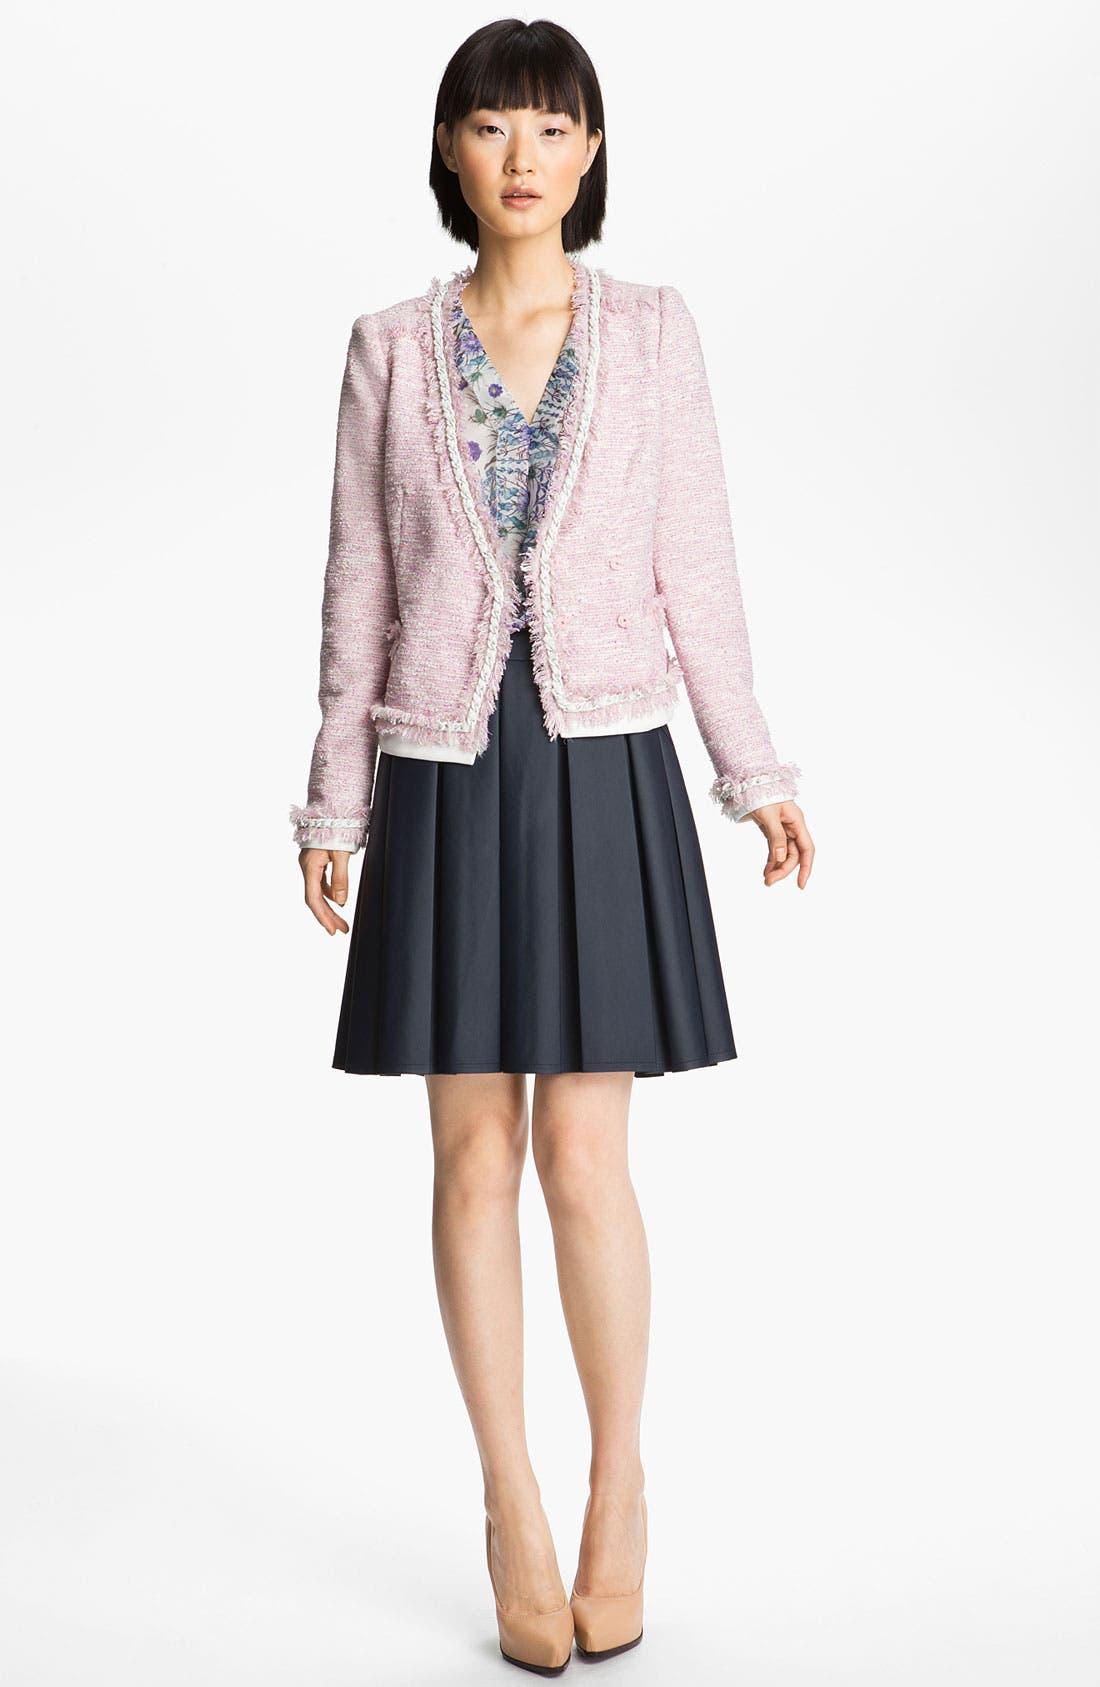 Alternate Image 1 Selected - Mcginn 'Sophia' Tweed Jacket